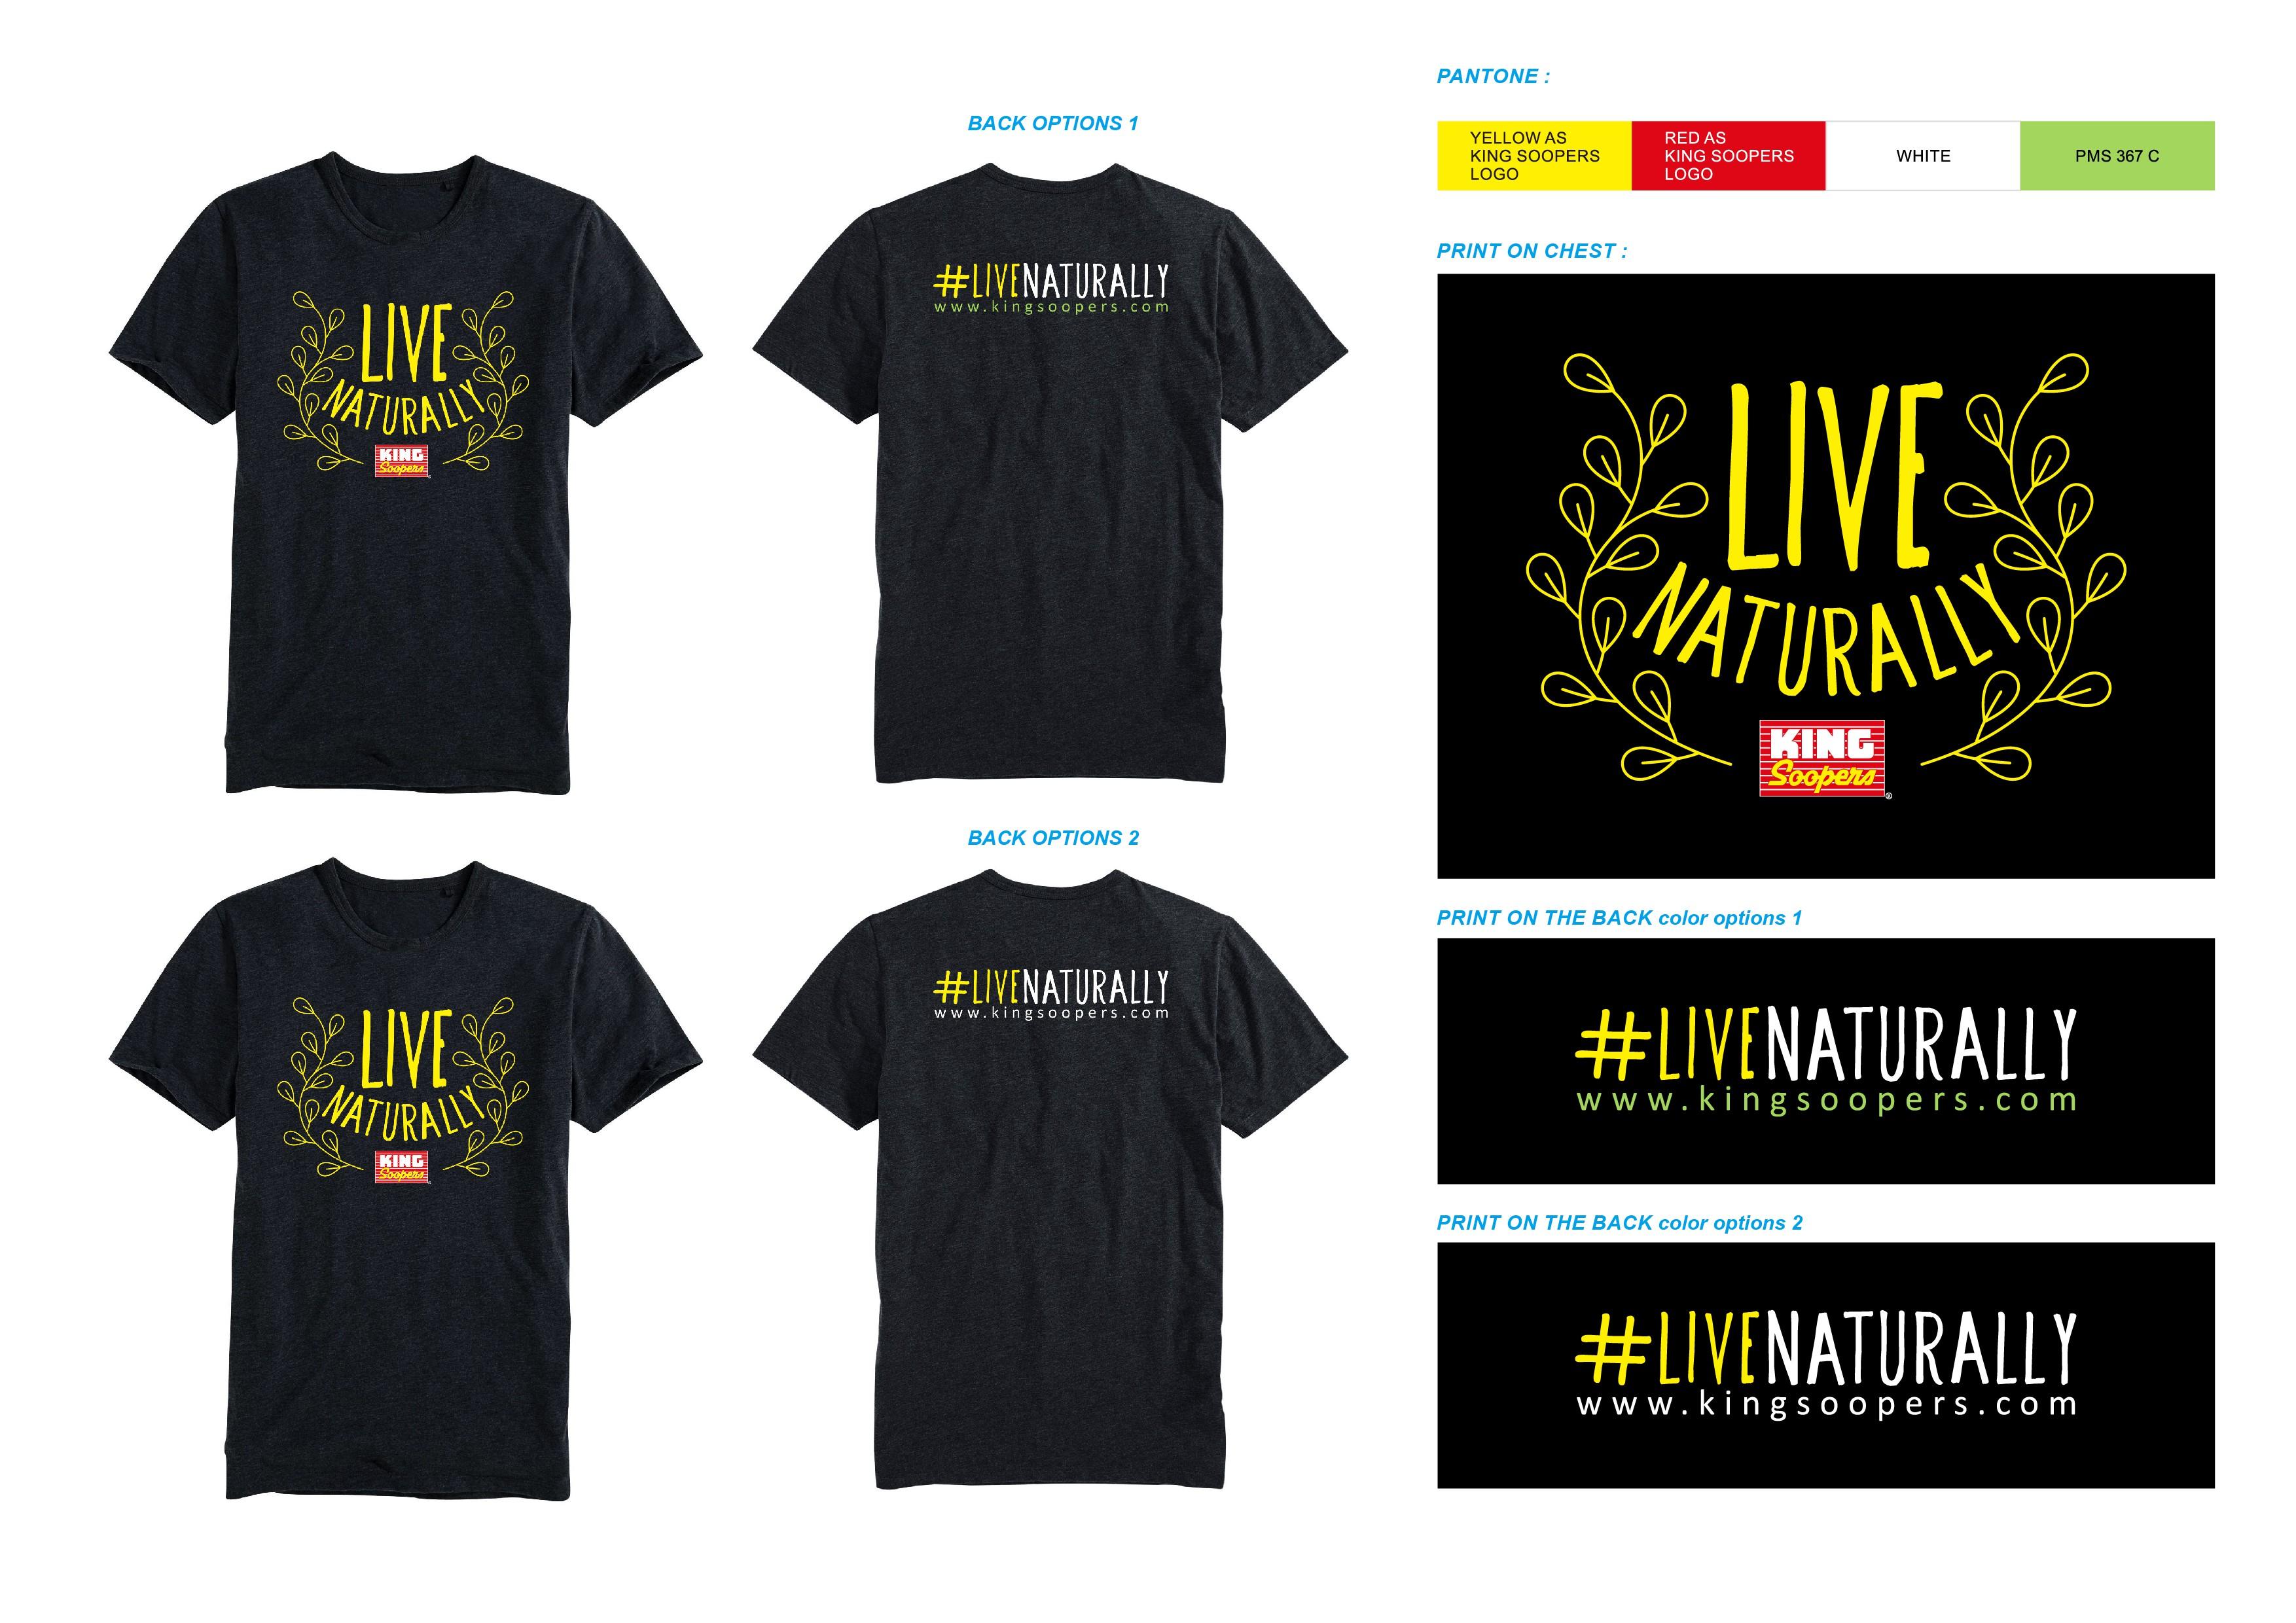 Live Naturally (T-Shirt)